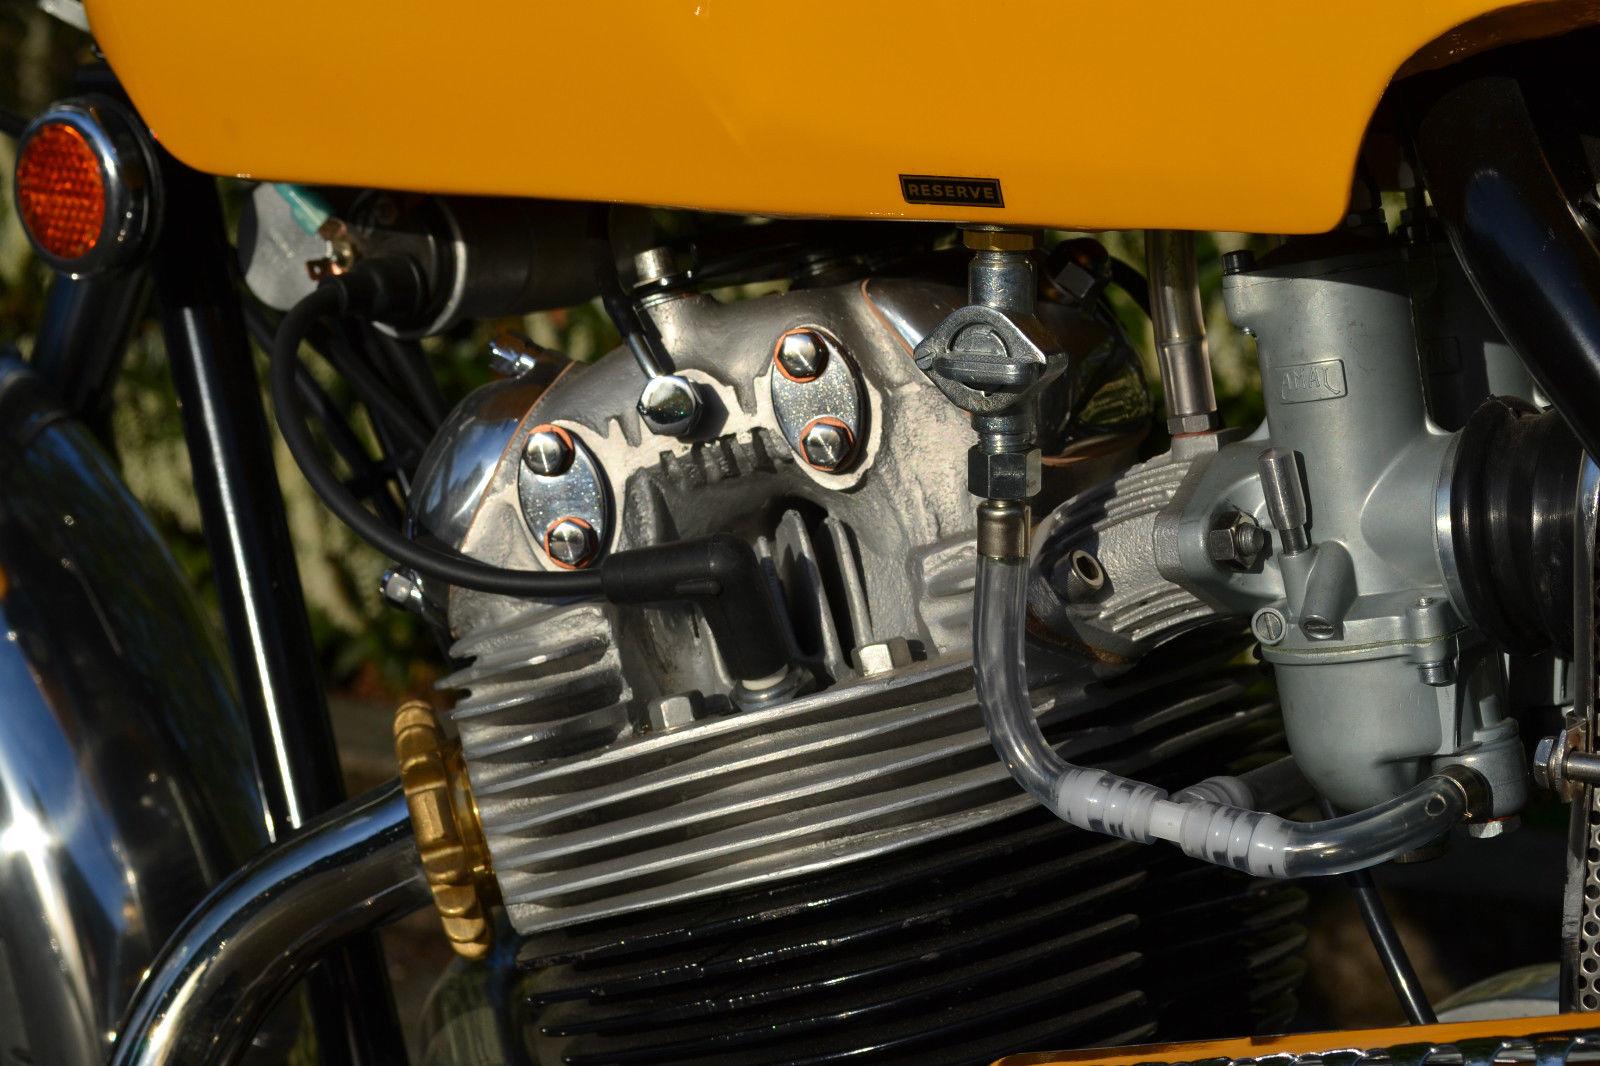 Norton Commando S-Type - 1969 - Cylinder Head, Fuel Tap, Fuel Line and Spark Plug.